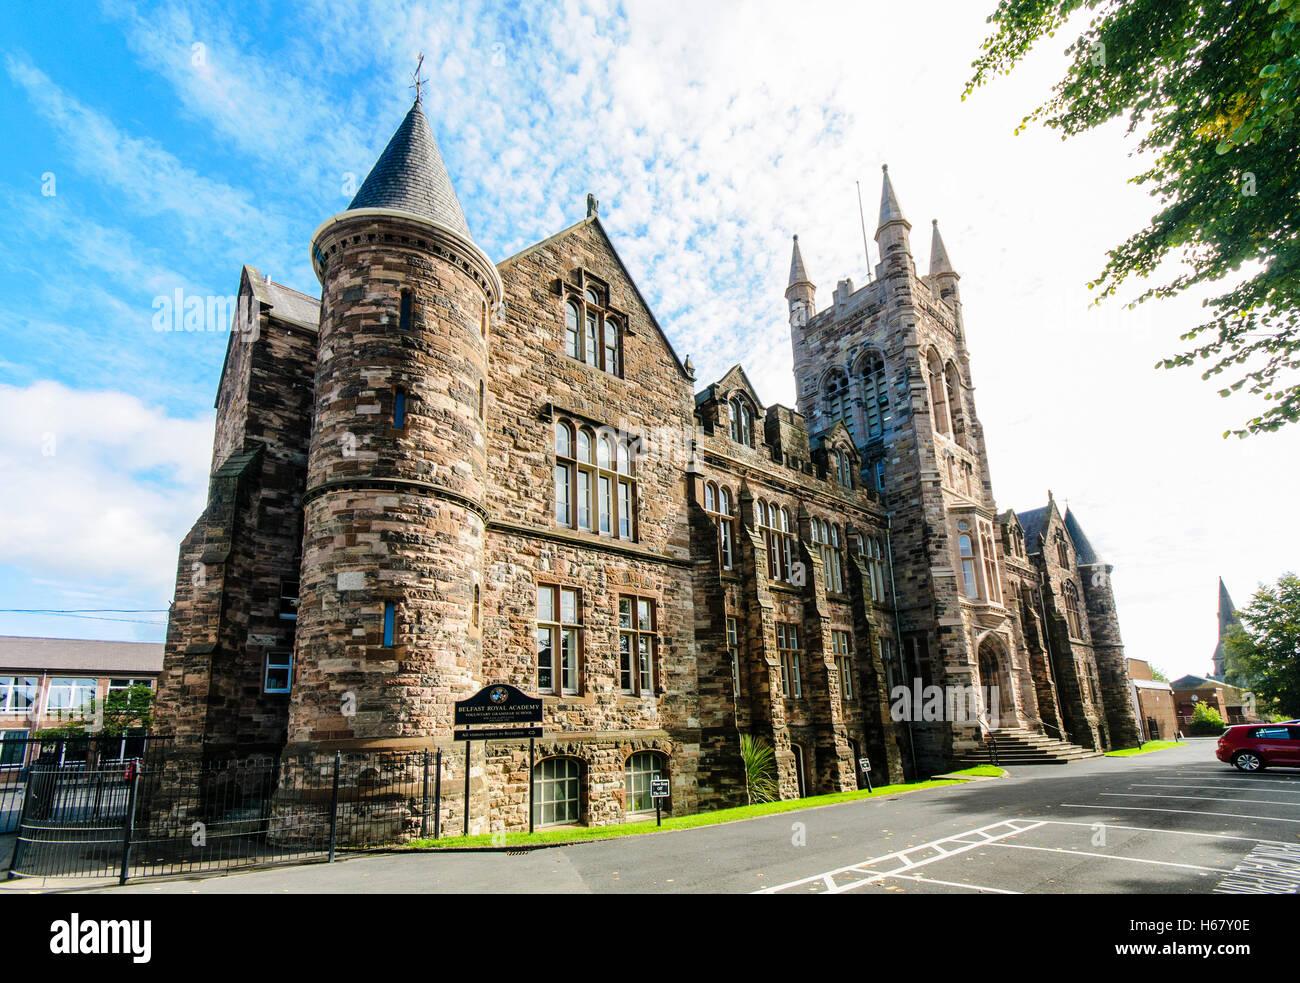 Lanyon Building, Belfast Royal Academy (BRA) grammar school in North Belfast, Northern Ireland. - Stock Image